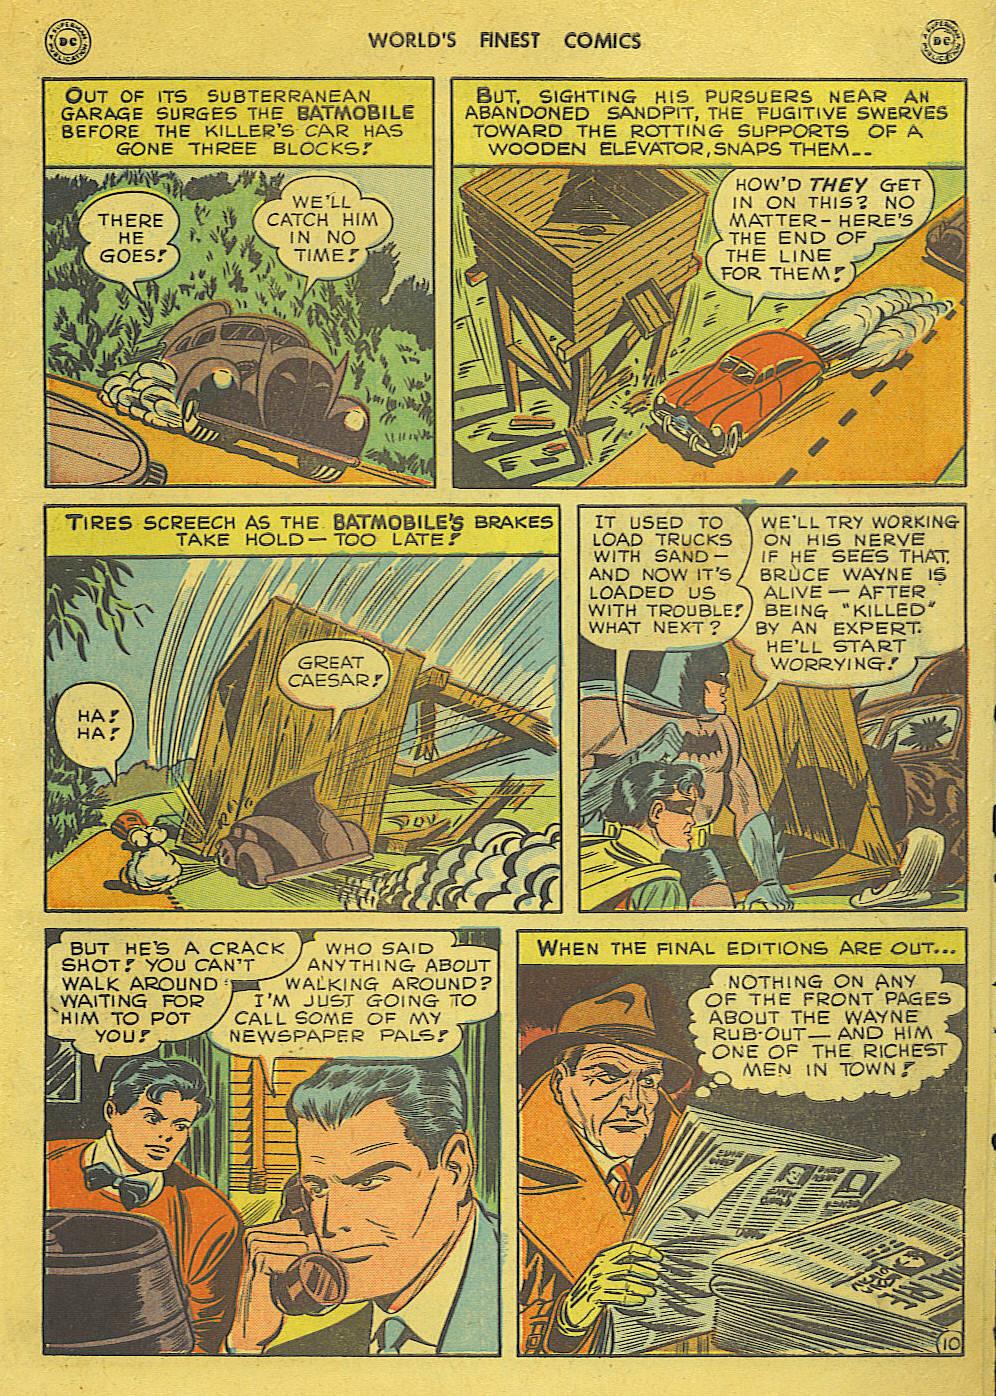 Read online World's Finest Comics comic -  Issue #34 - 71